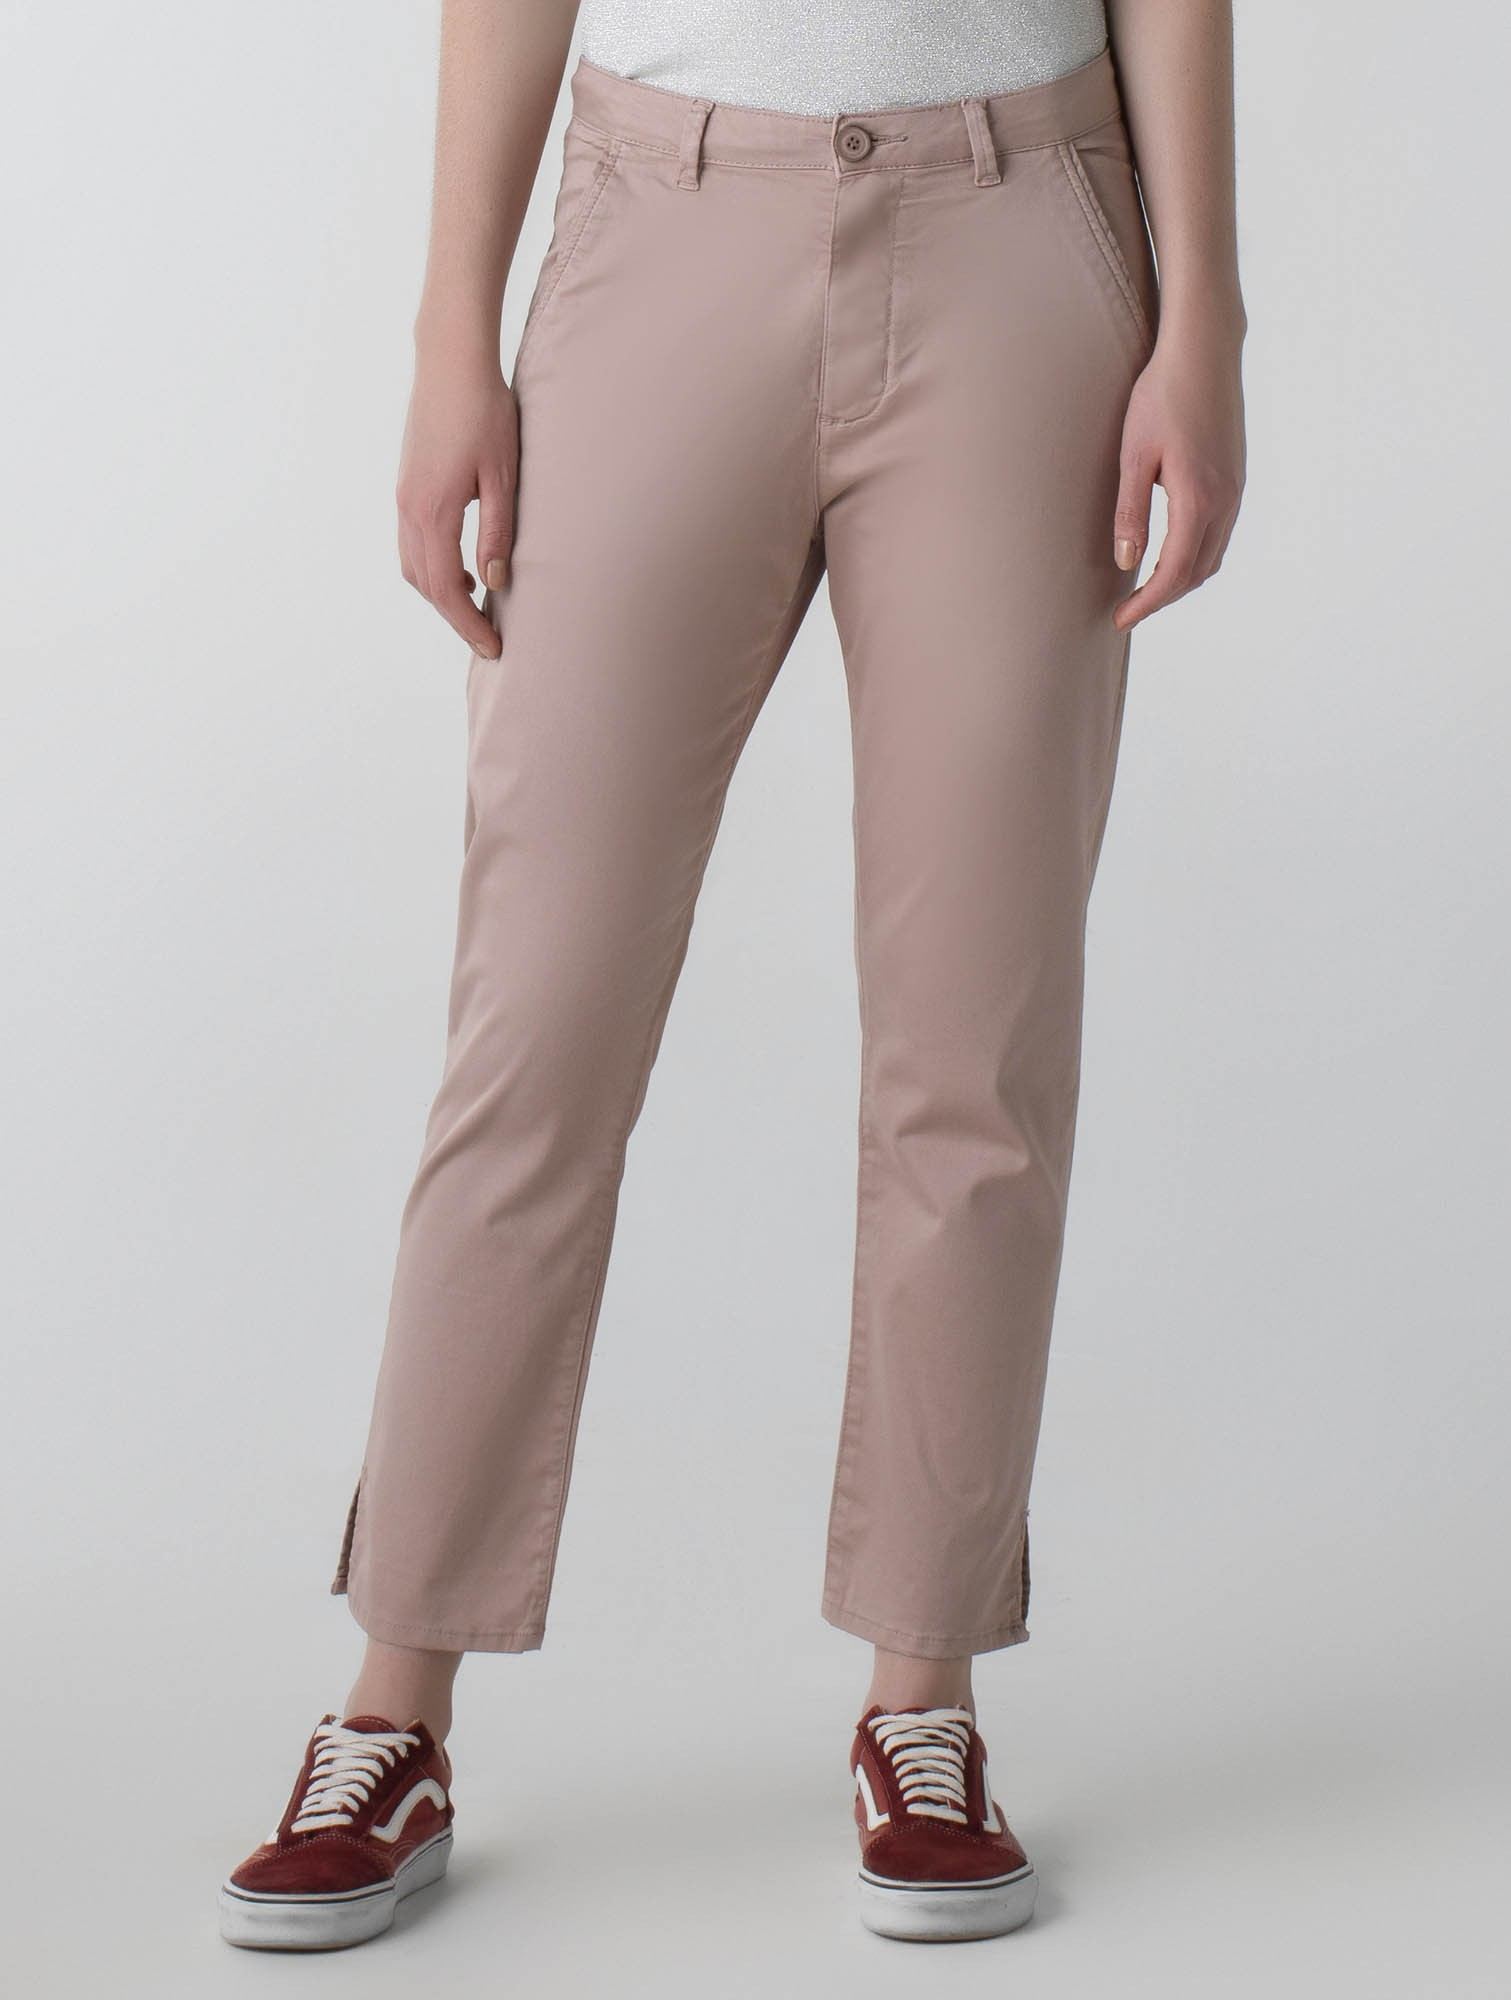 Calça sarja reta colors cós alto - Daily